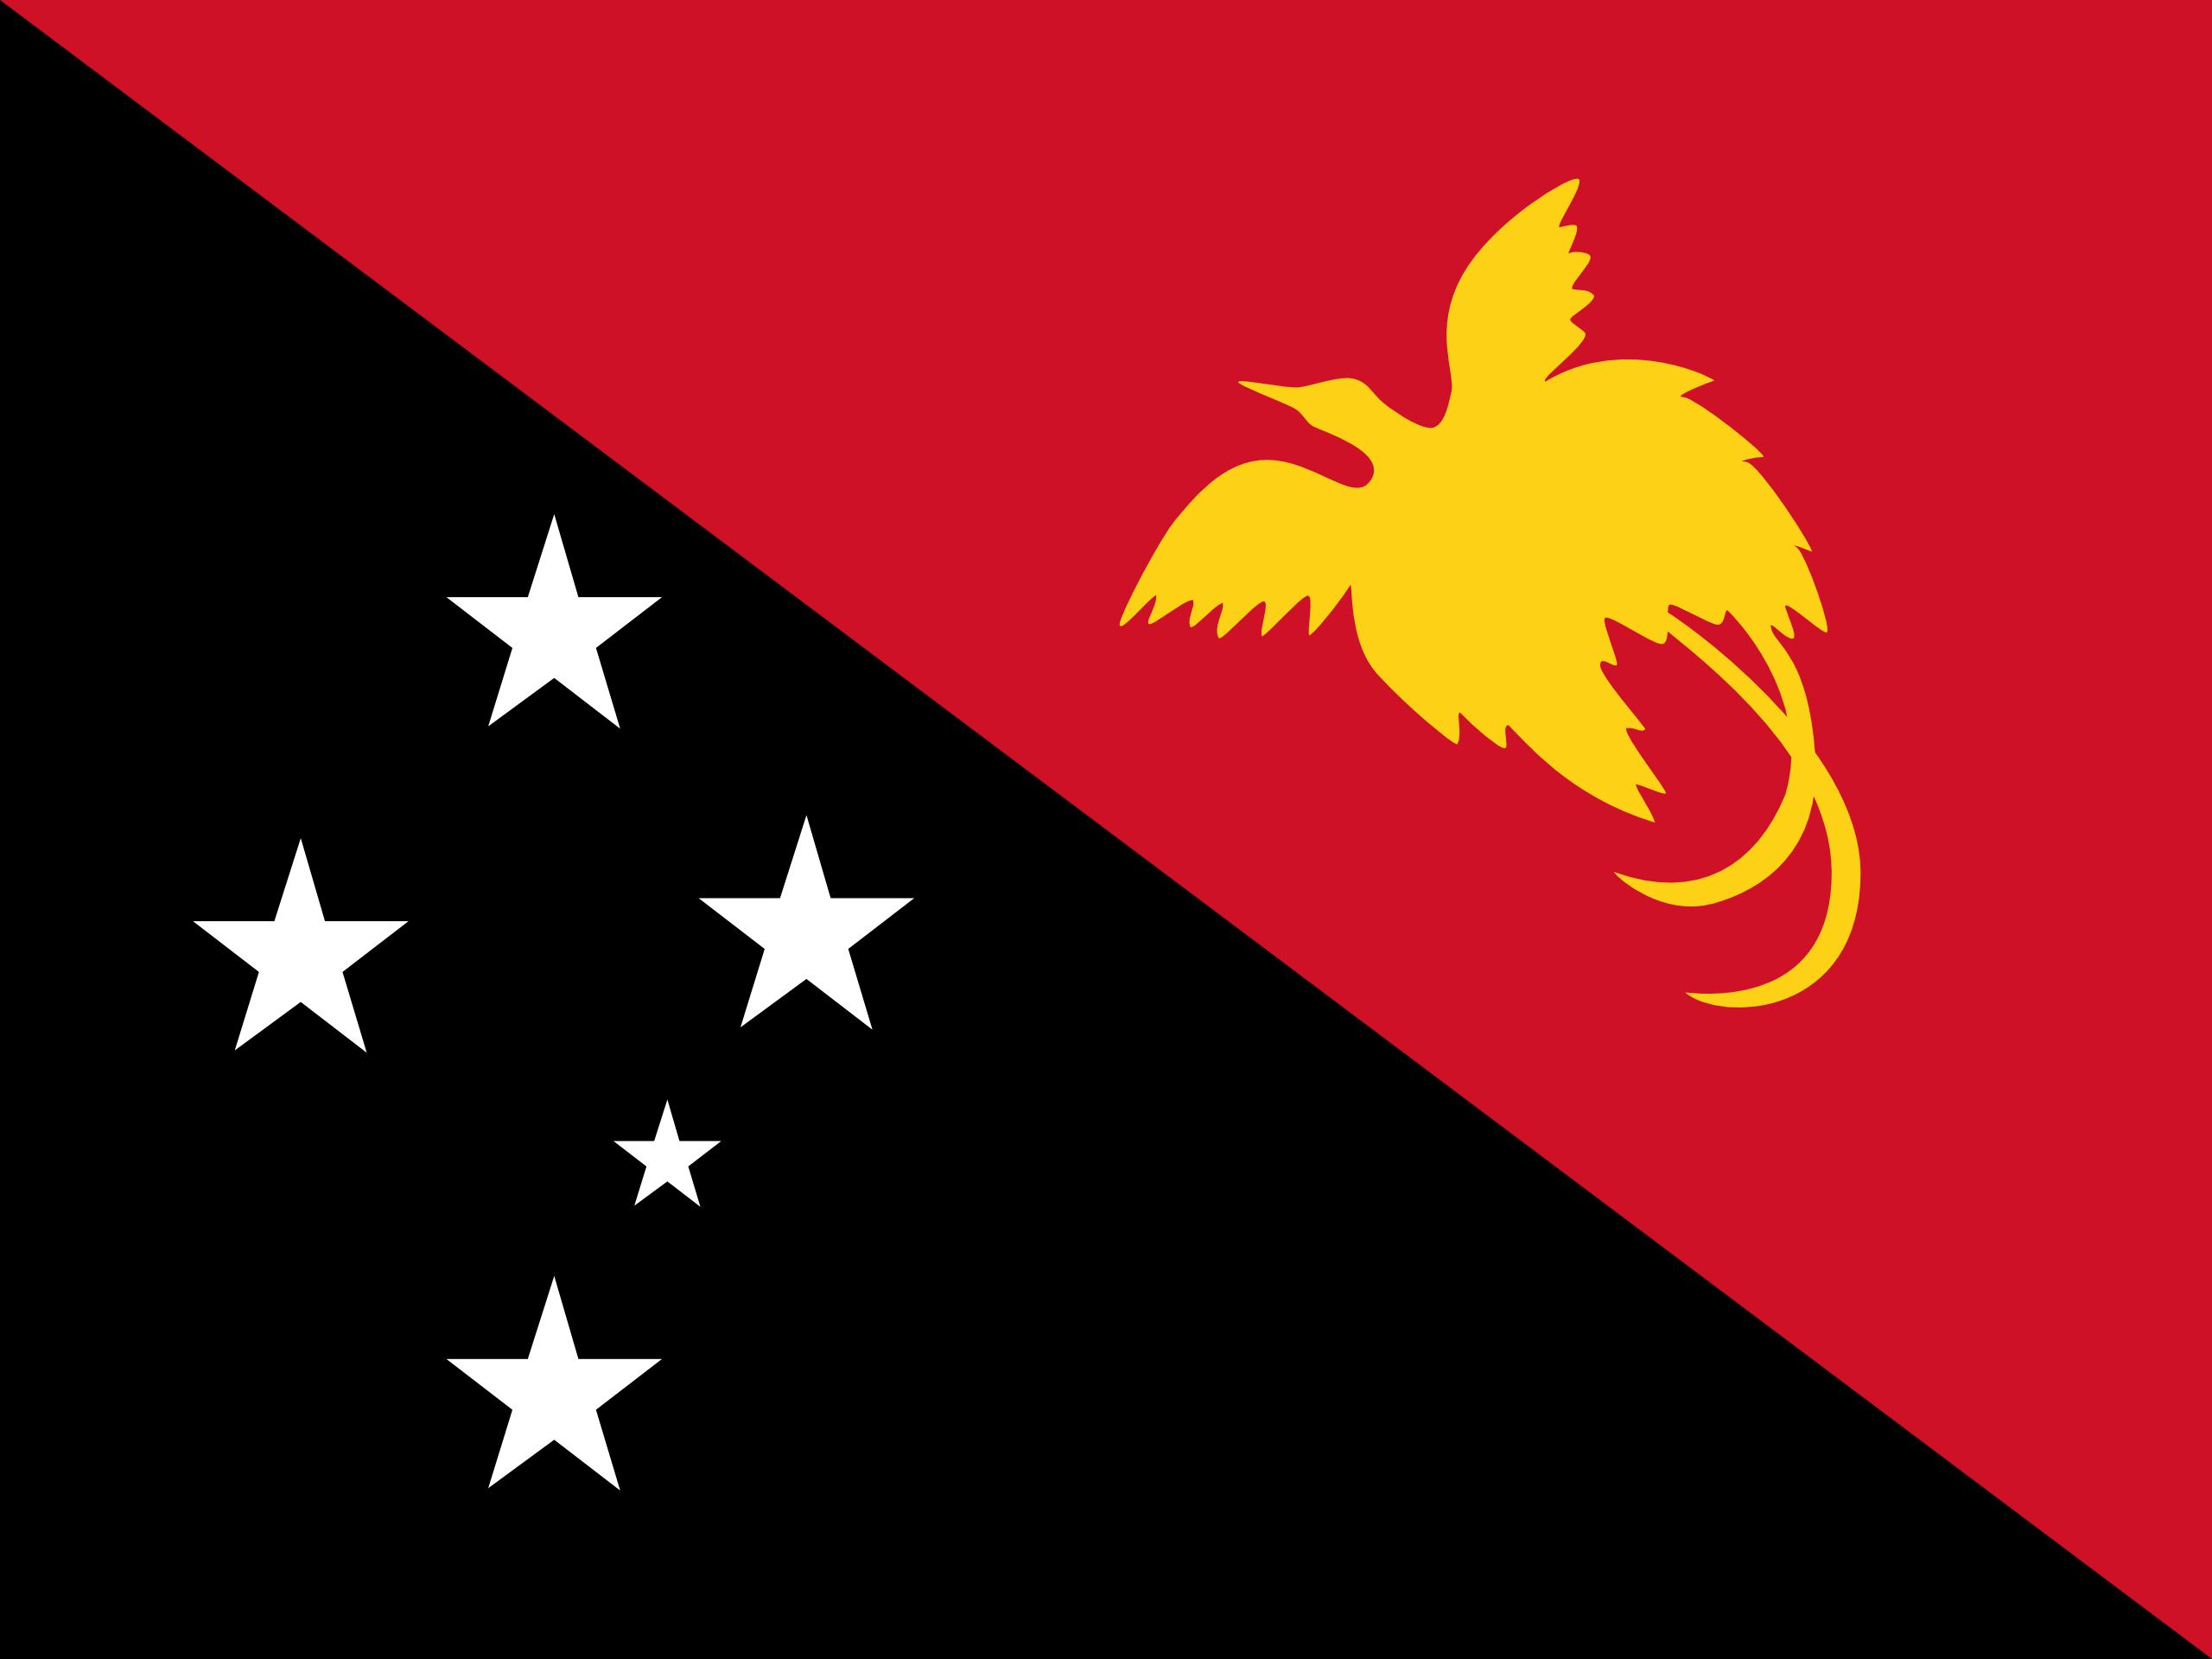 papúa nueva guinea, país, emblema, insignia, σύμβολο - Wallpapers HD - Professor-falken.com